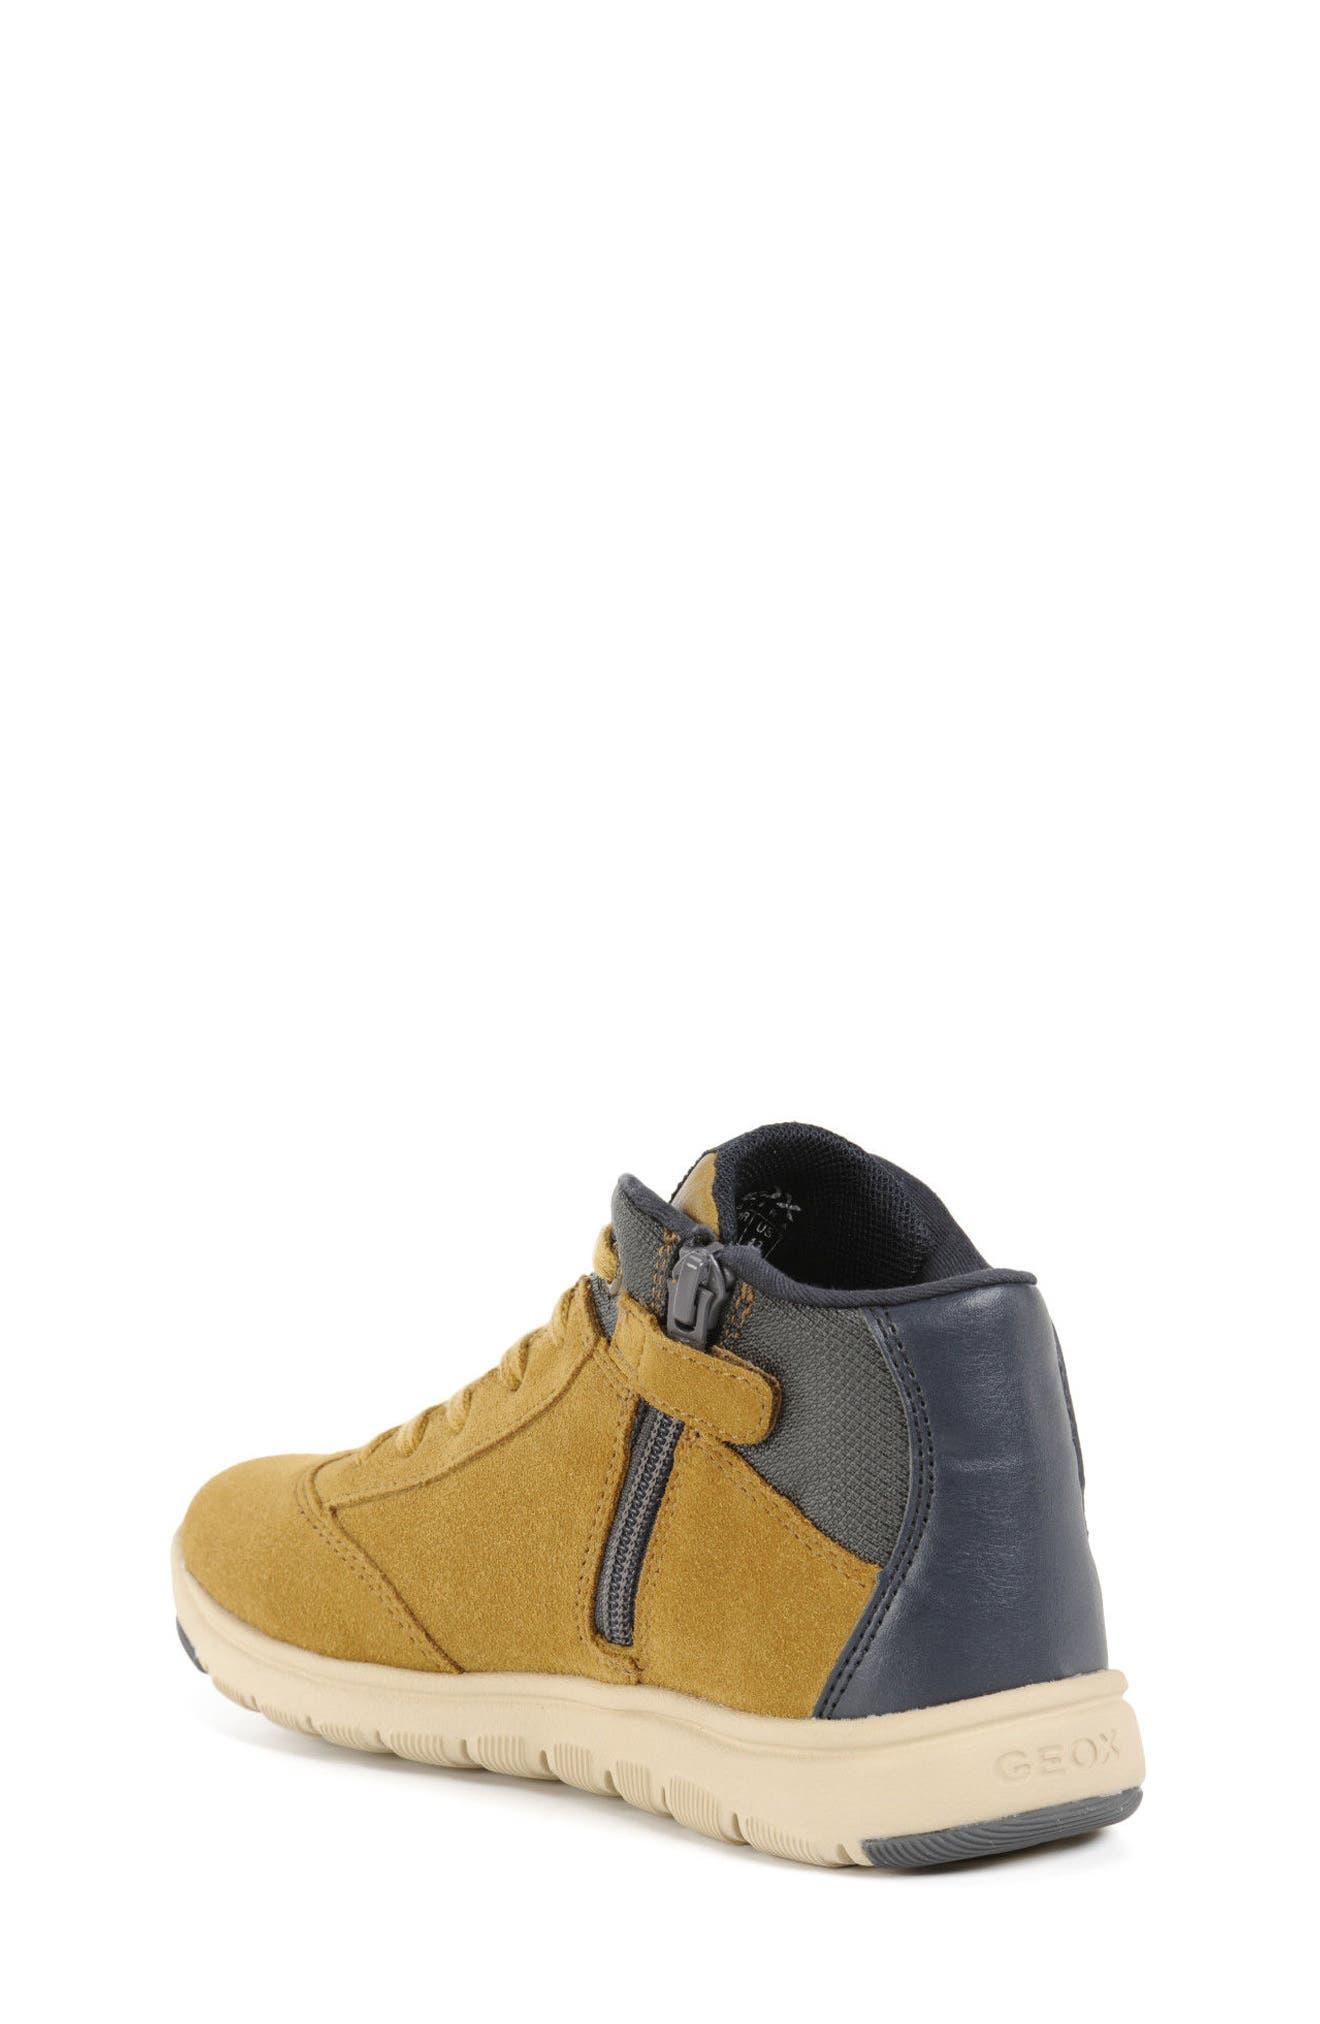 Alternate Image 2  - Geox Xunday Mid Top Sneaker (Toddler, Little Kid & Big Kid)